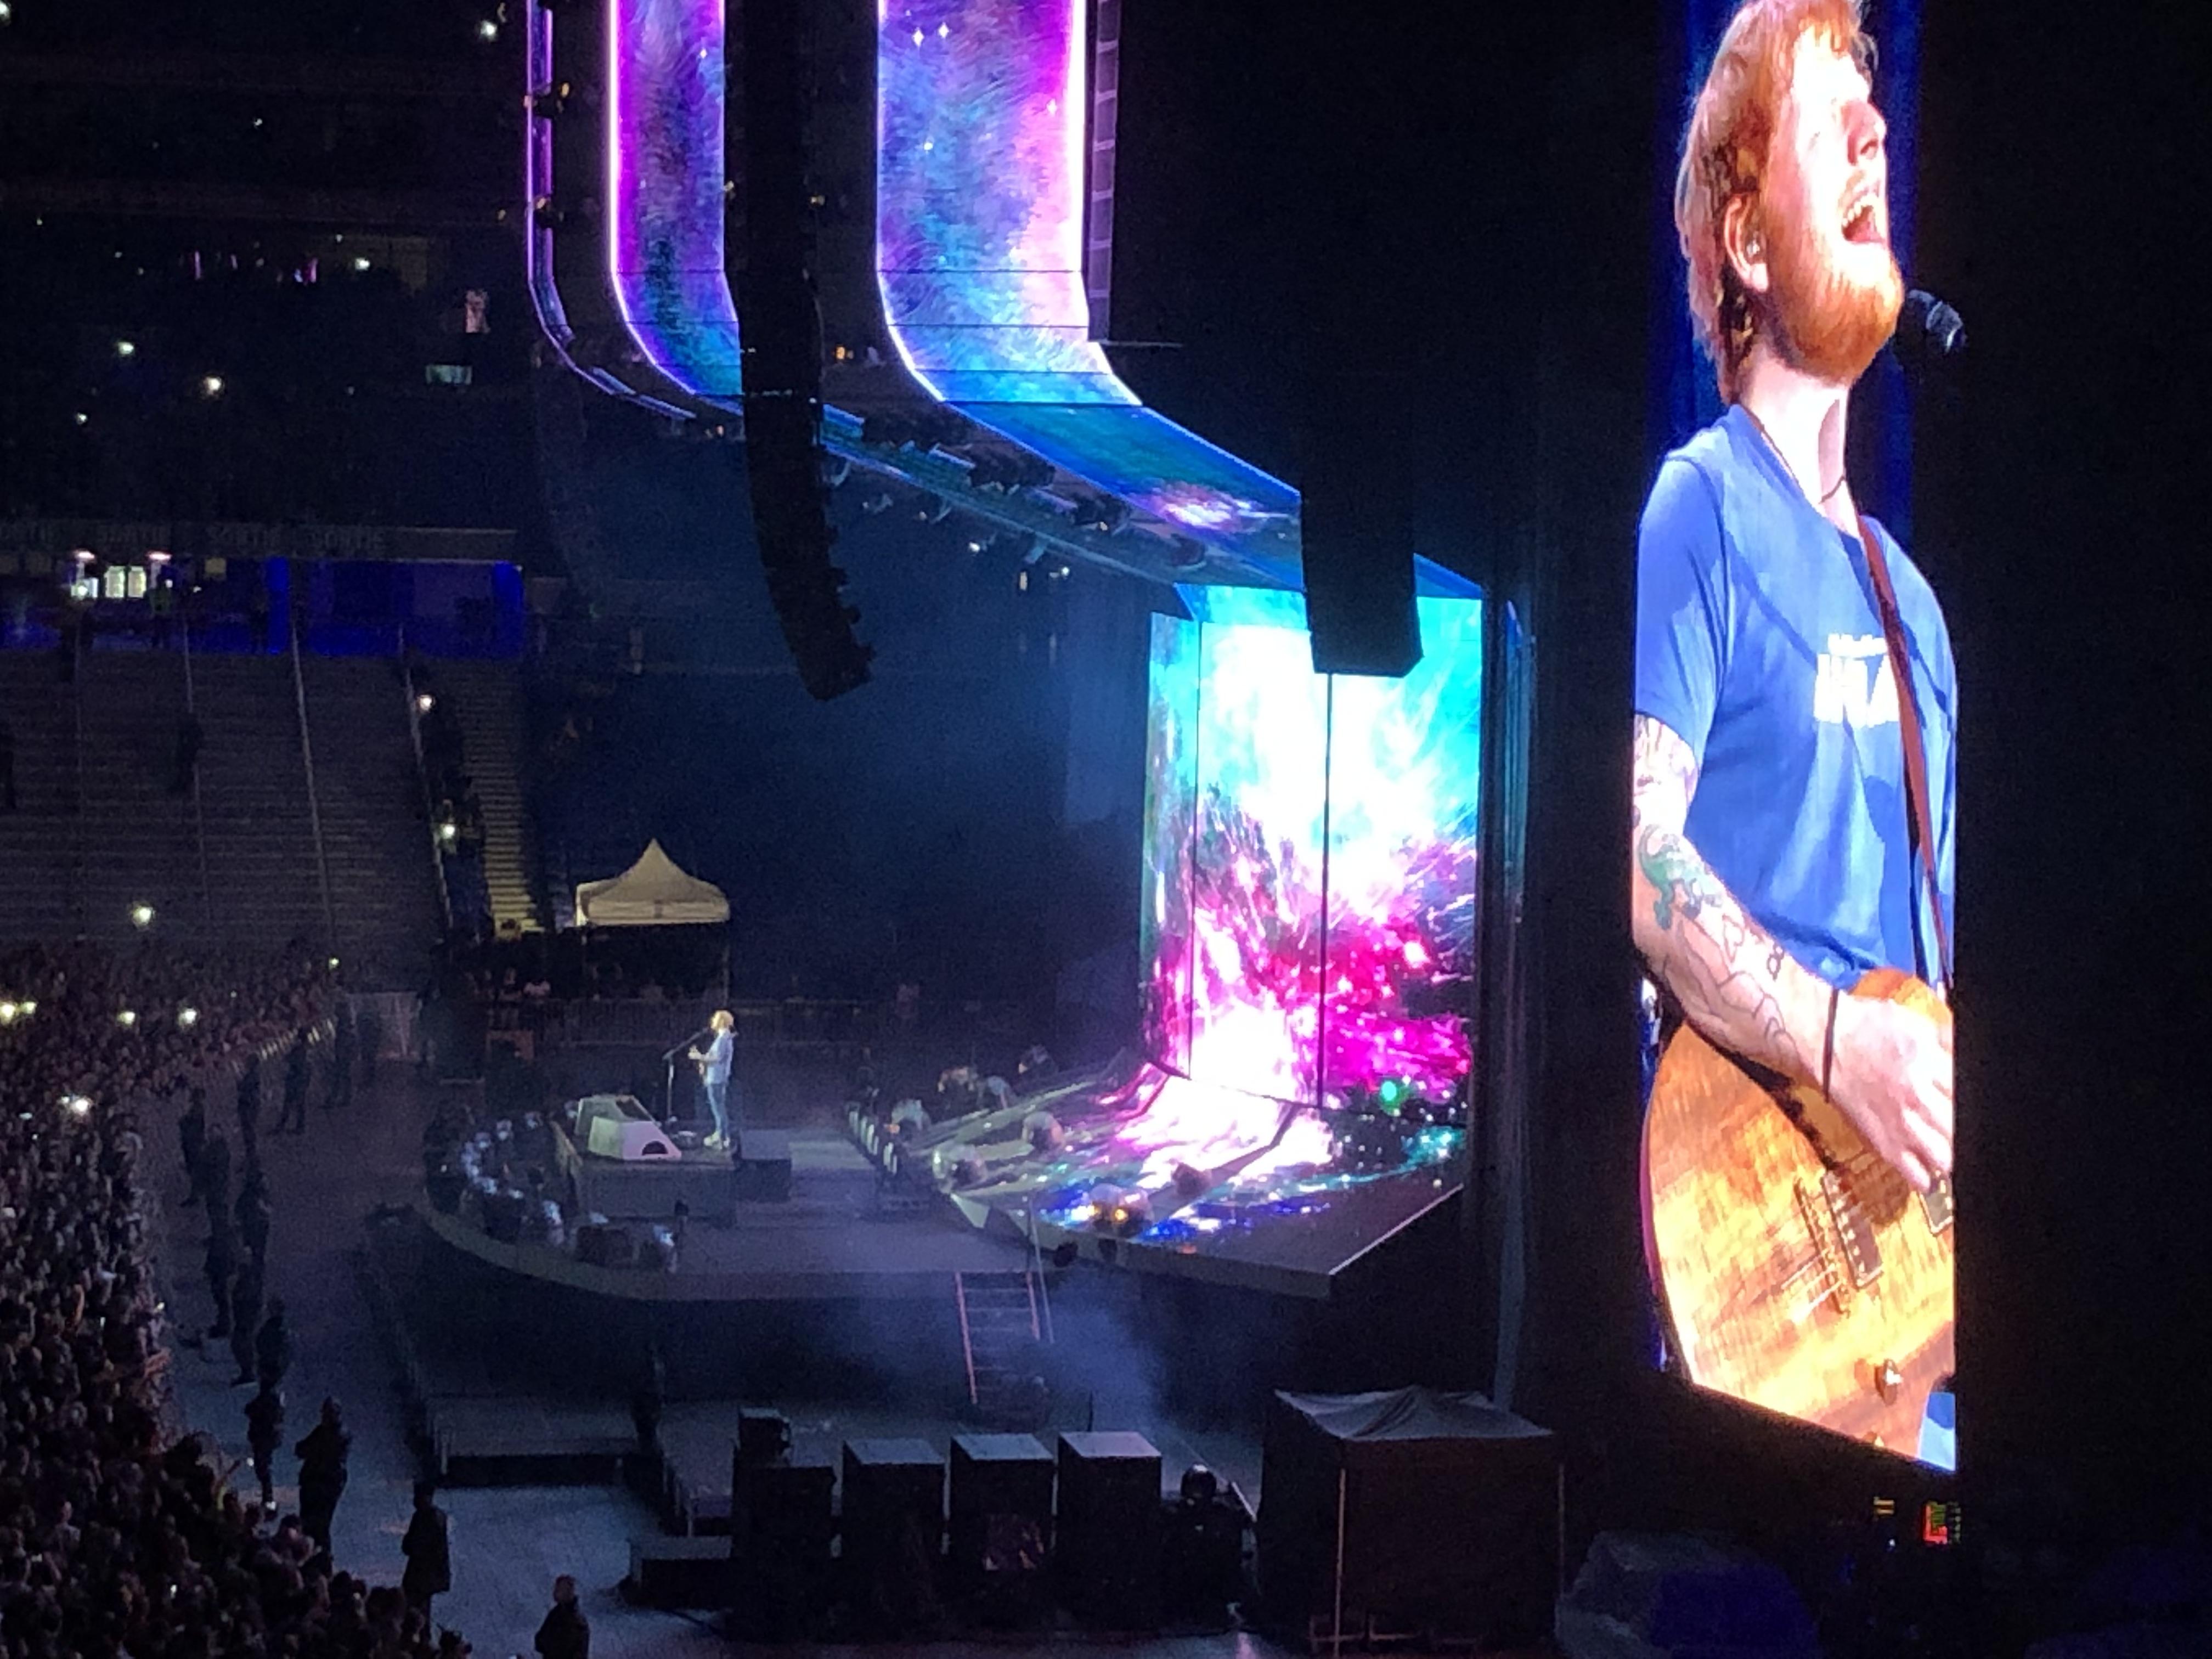 « Ed Sheeran, mon premier concert. Au top ! »